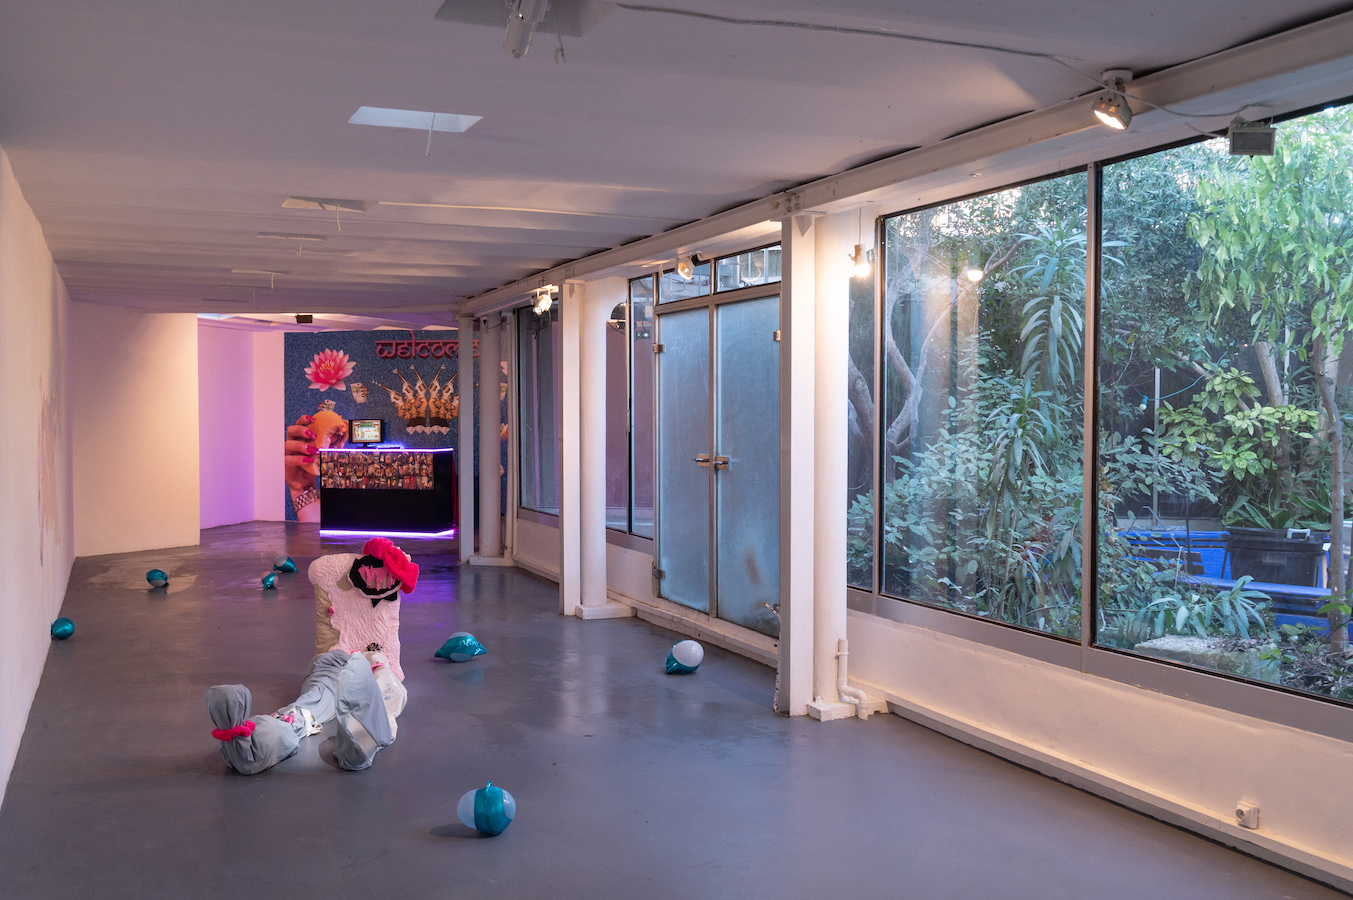 Vue d'exposition La relève III, installation Sarah Netter, installation Silina Syan, 2021 © Photo Raphaël Arnaud | art-cade*